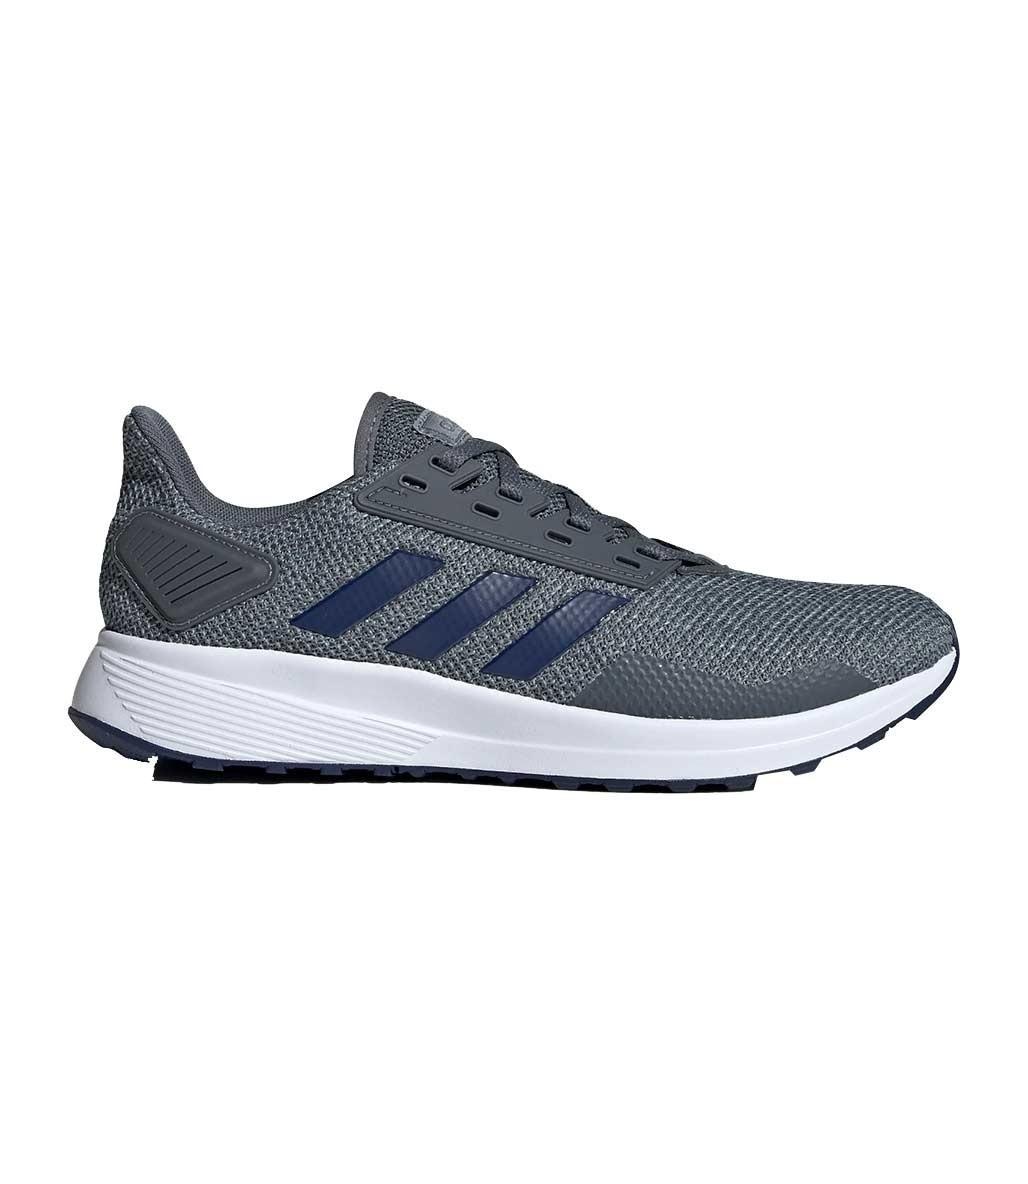 Adidas Duramo 9 Ayakkabı Gri